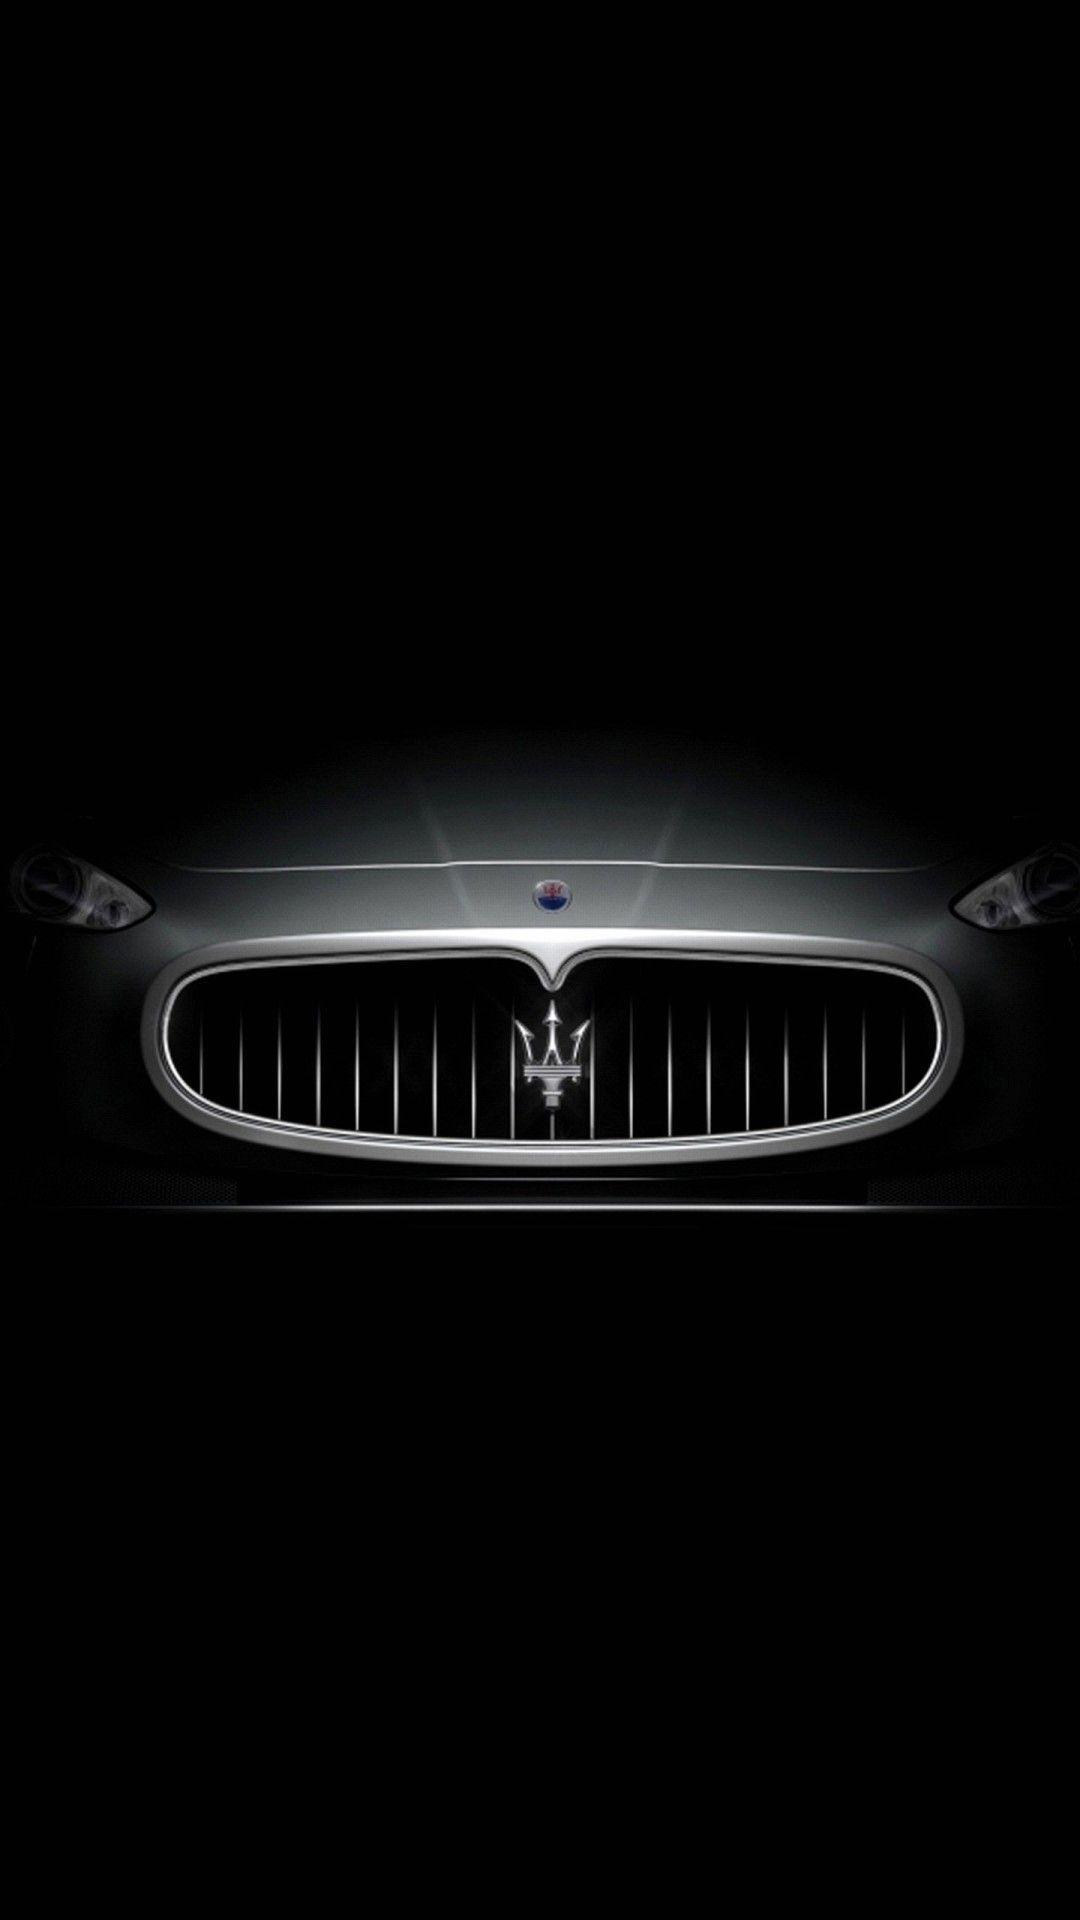 64 Maserati Logo Wallpapers on WallpaperPlay Supercars wallpaper 1080x1920